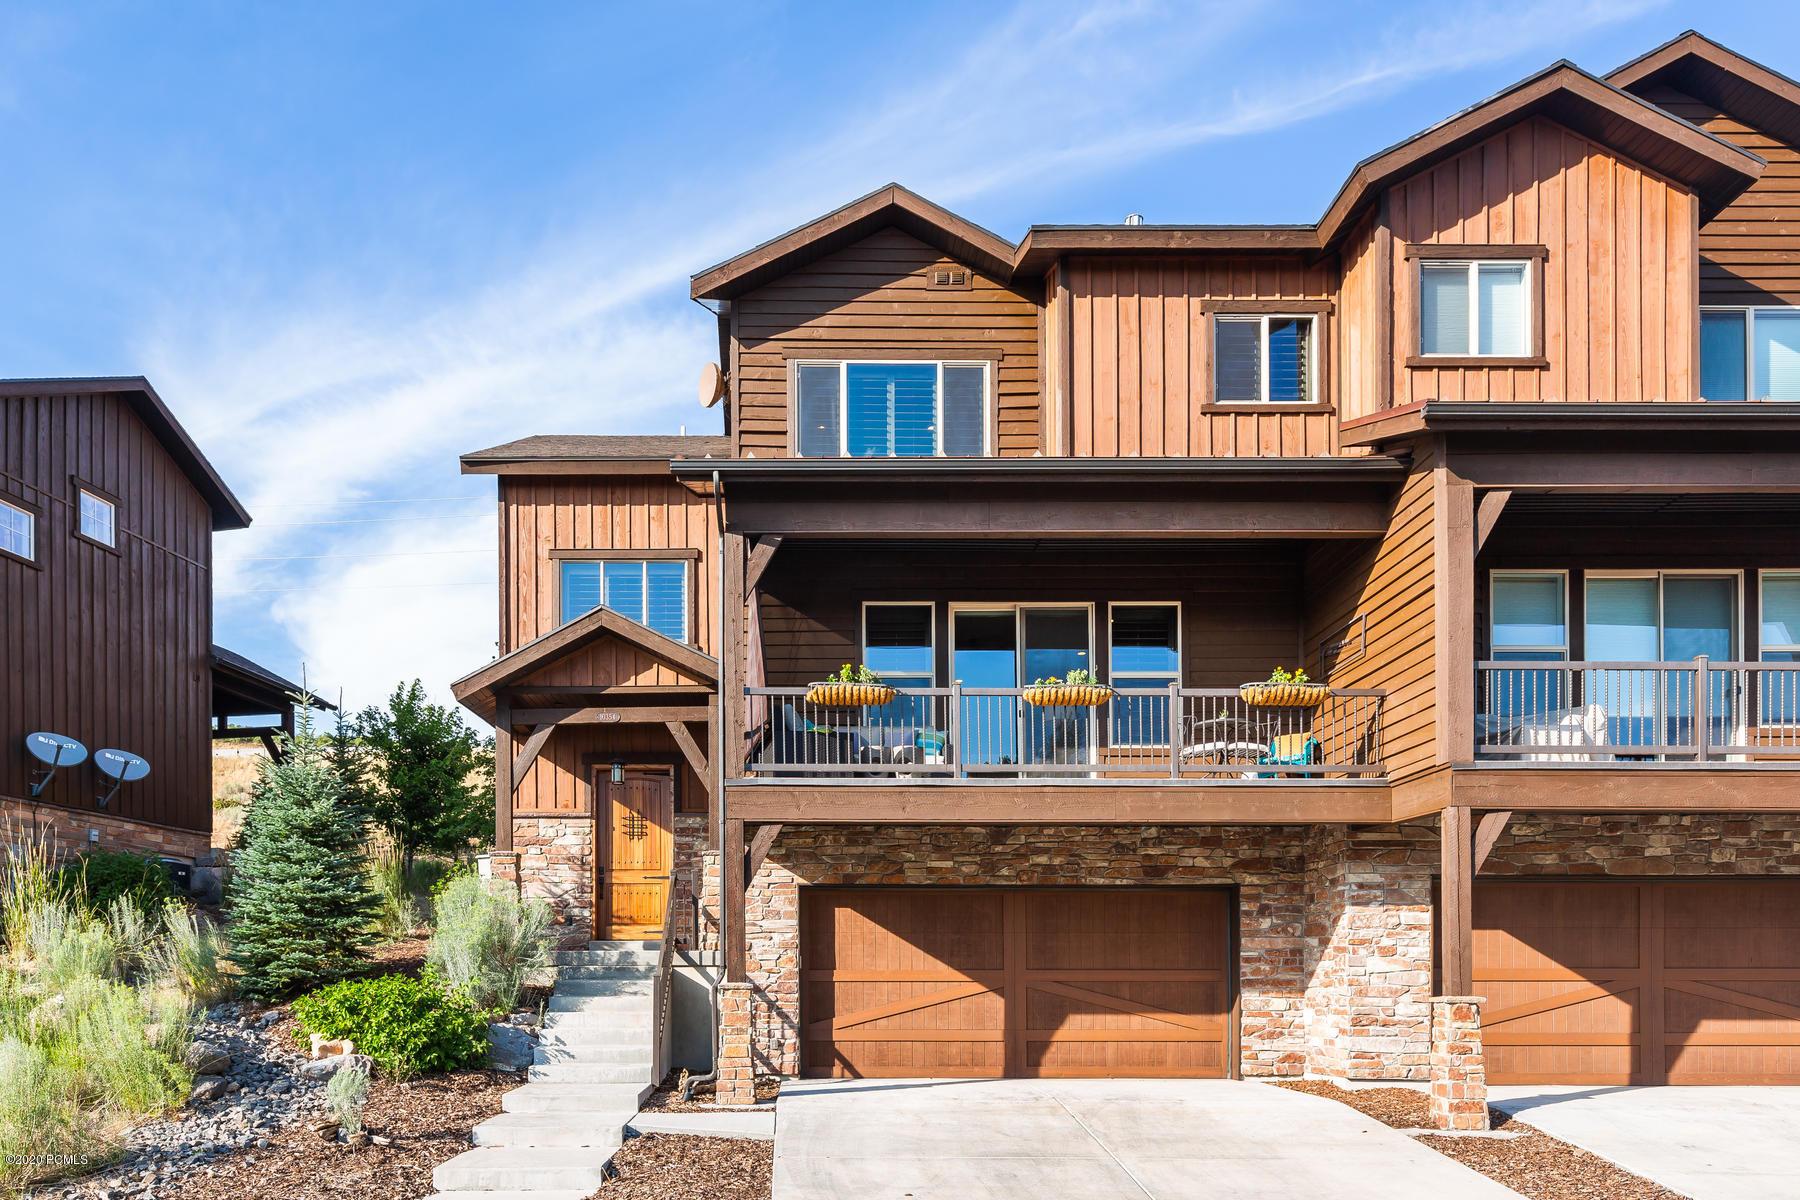 10354 Sightline Circle, Hideout, Utah 84036, 4 Bedrooms Bedrooms, ,4 BathroomsBathrooms,Condominium,For Sale,Sightline,12003097